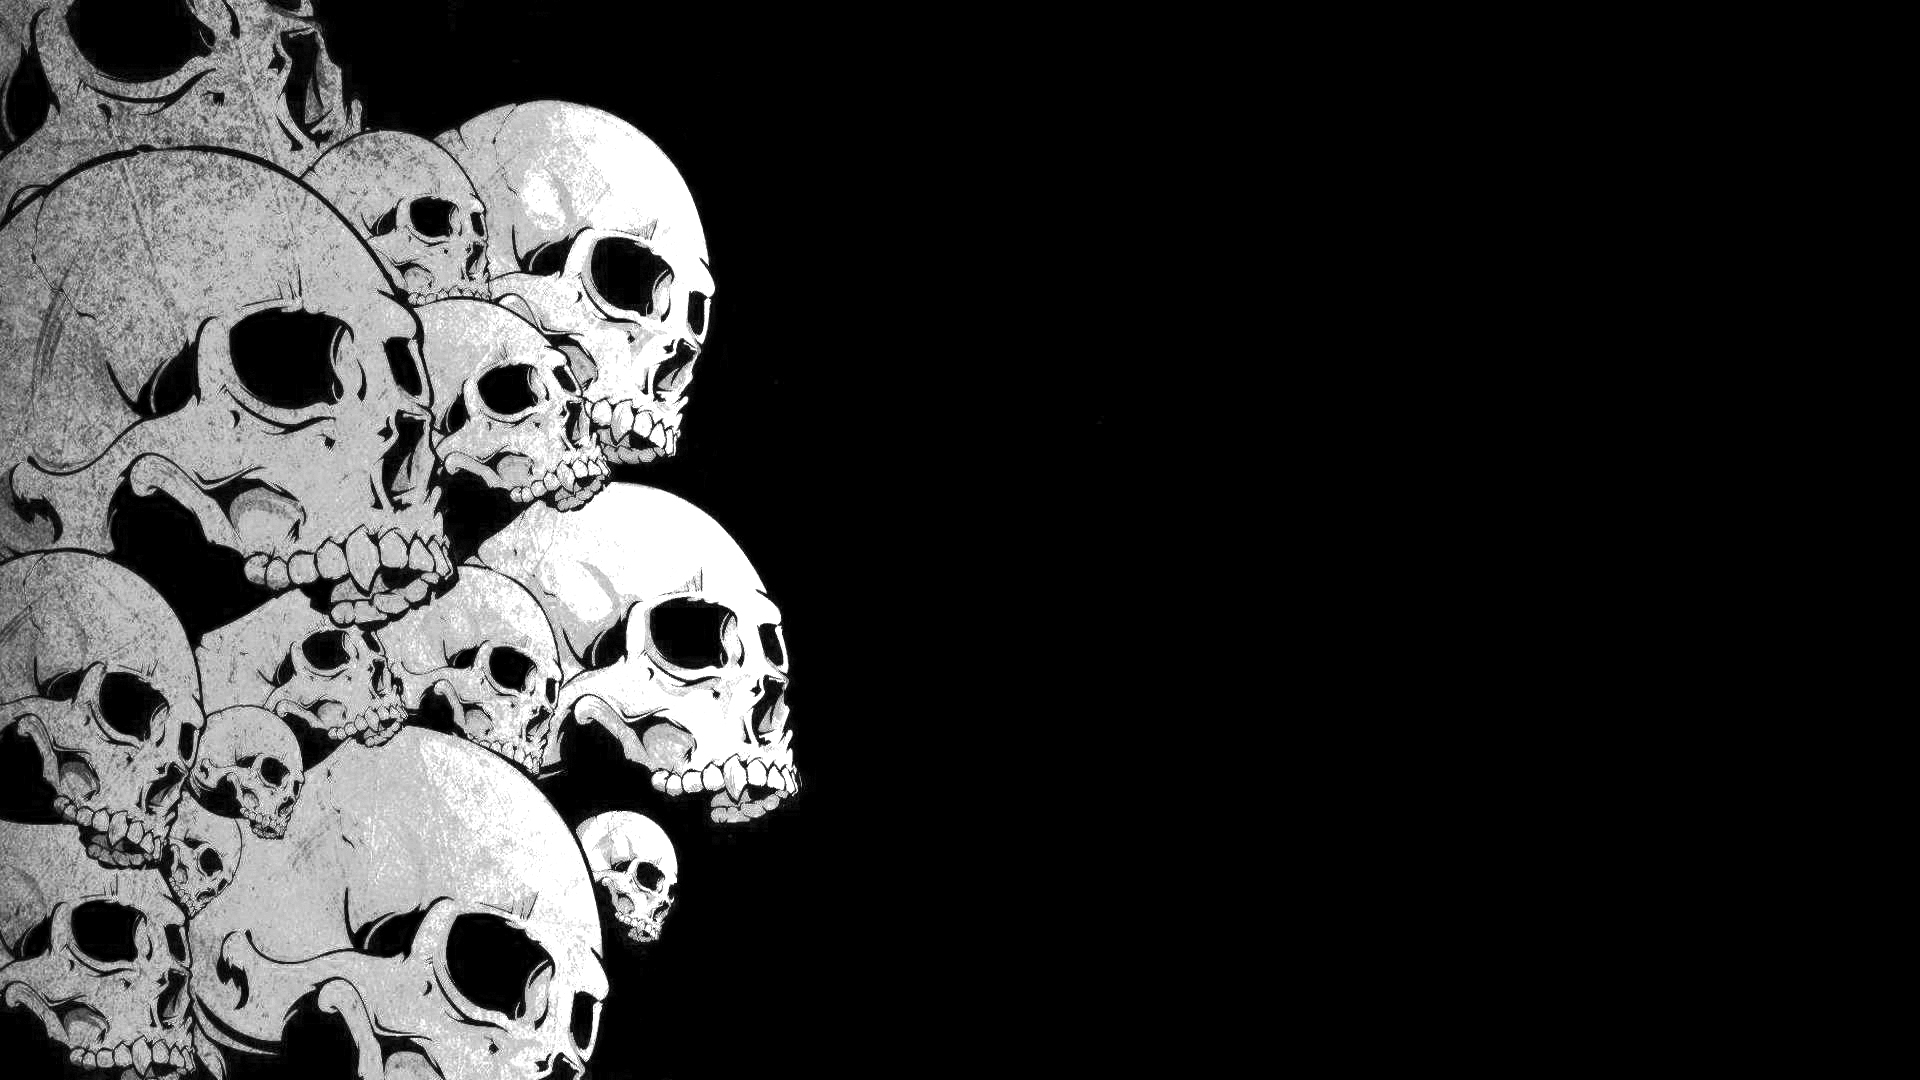 https://metalgalamoth.files.wordpress.com/2014/08/wallpaper-craneos.jpg